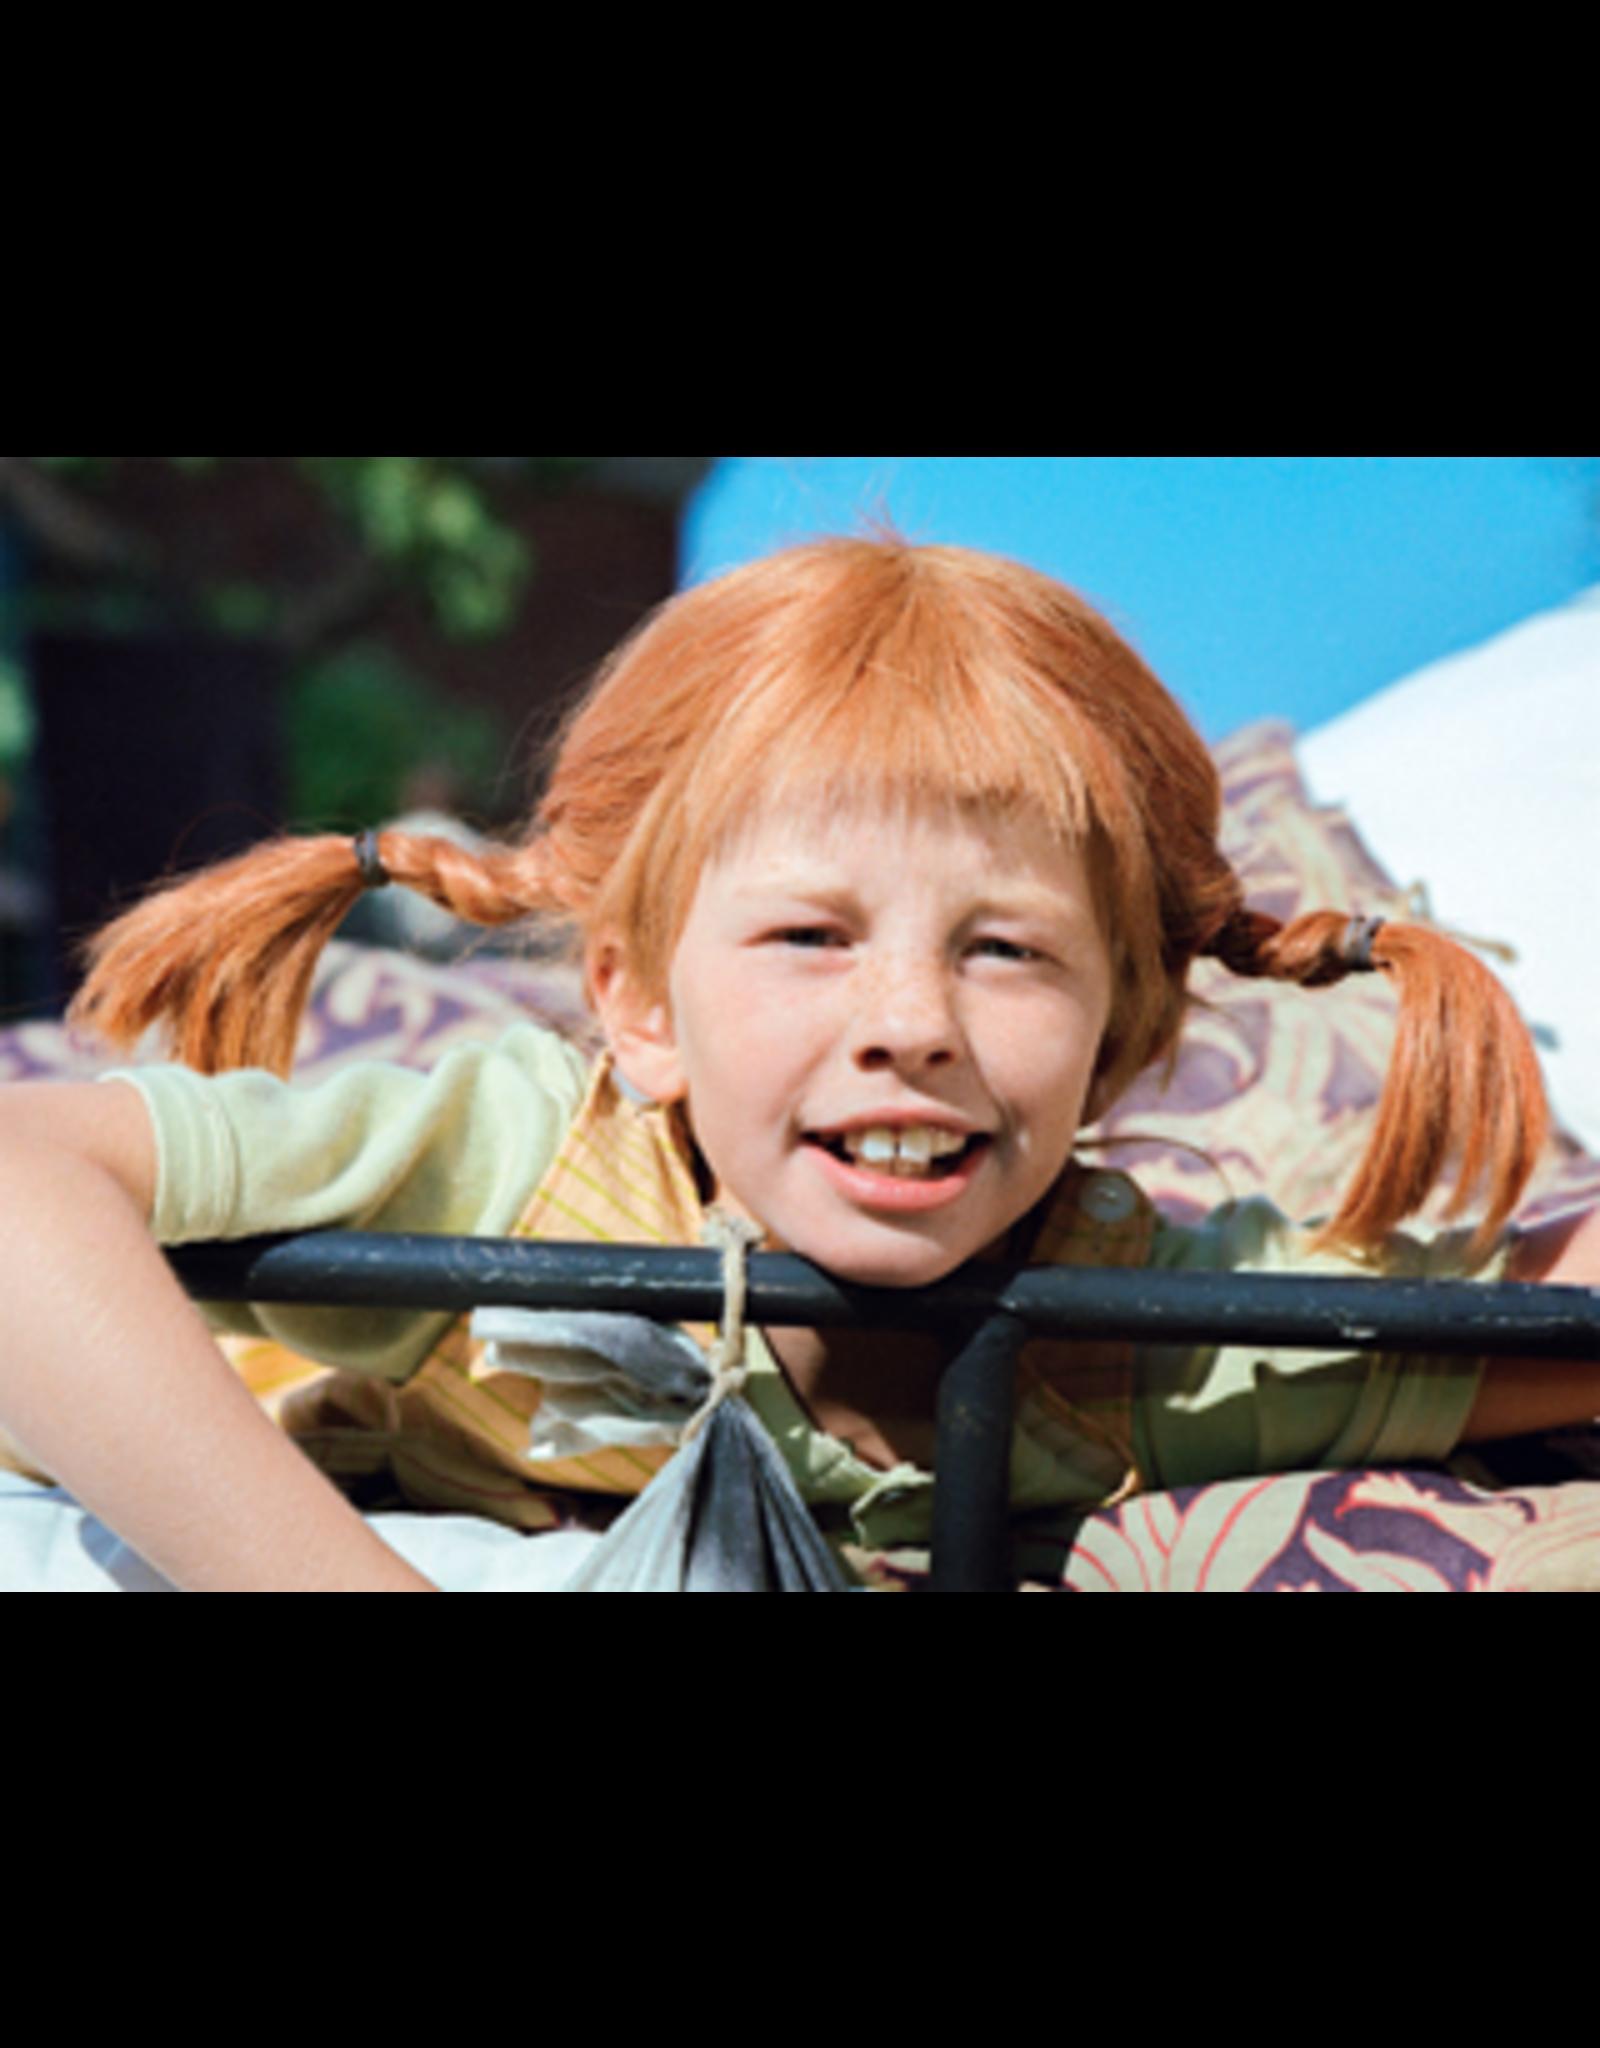 Pippi Langkous Pippi Longstocking card - Let's think